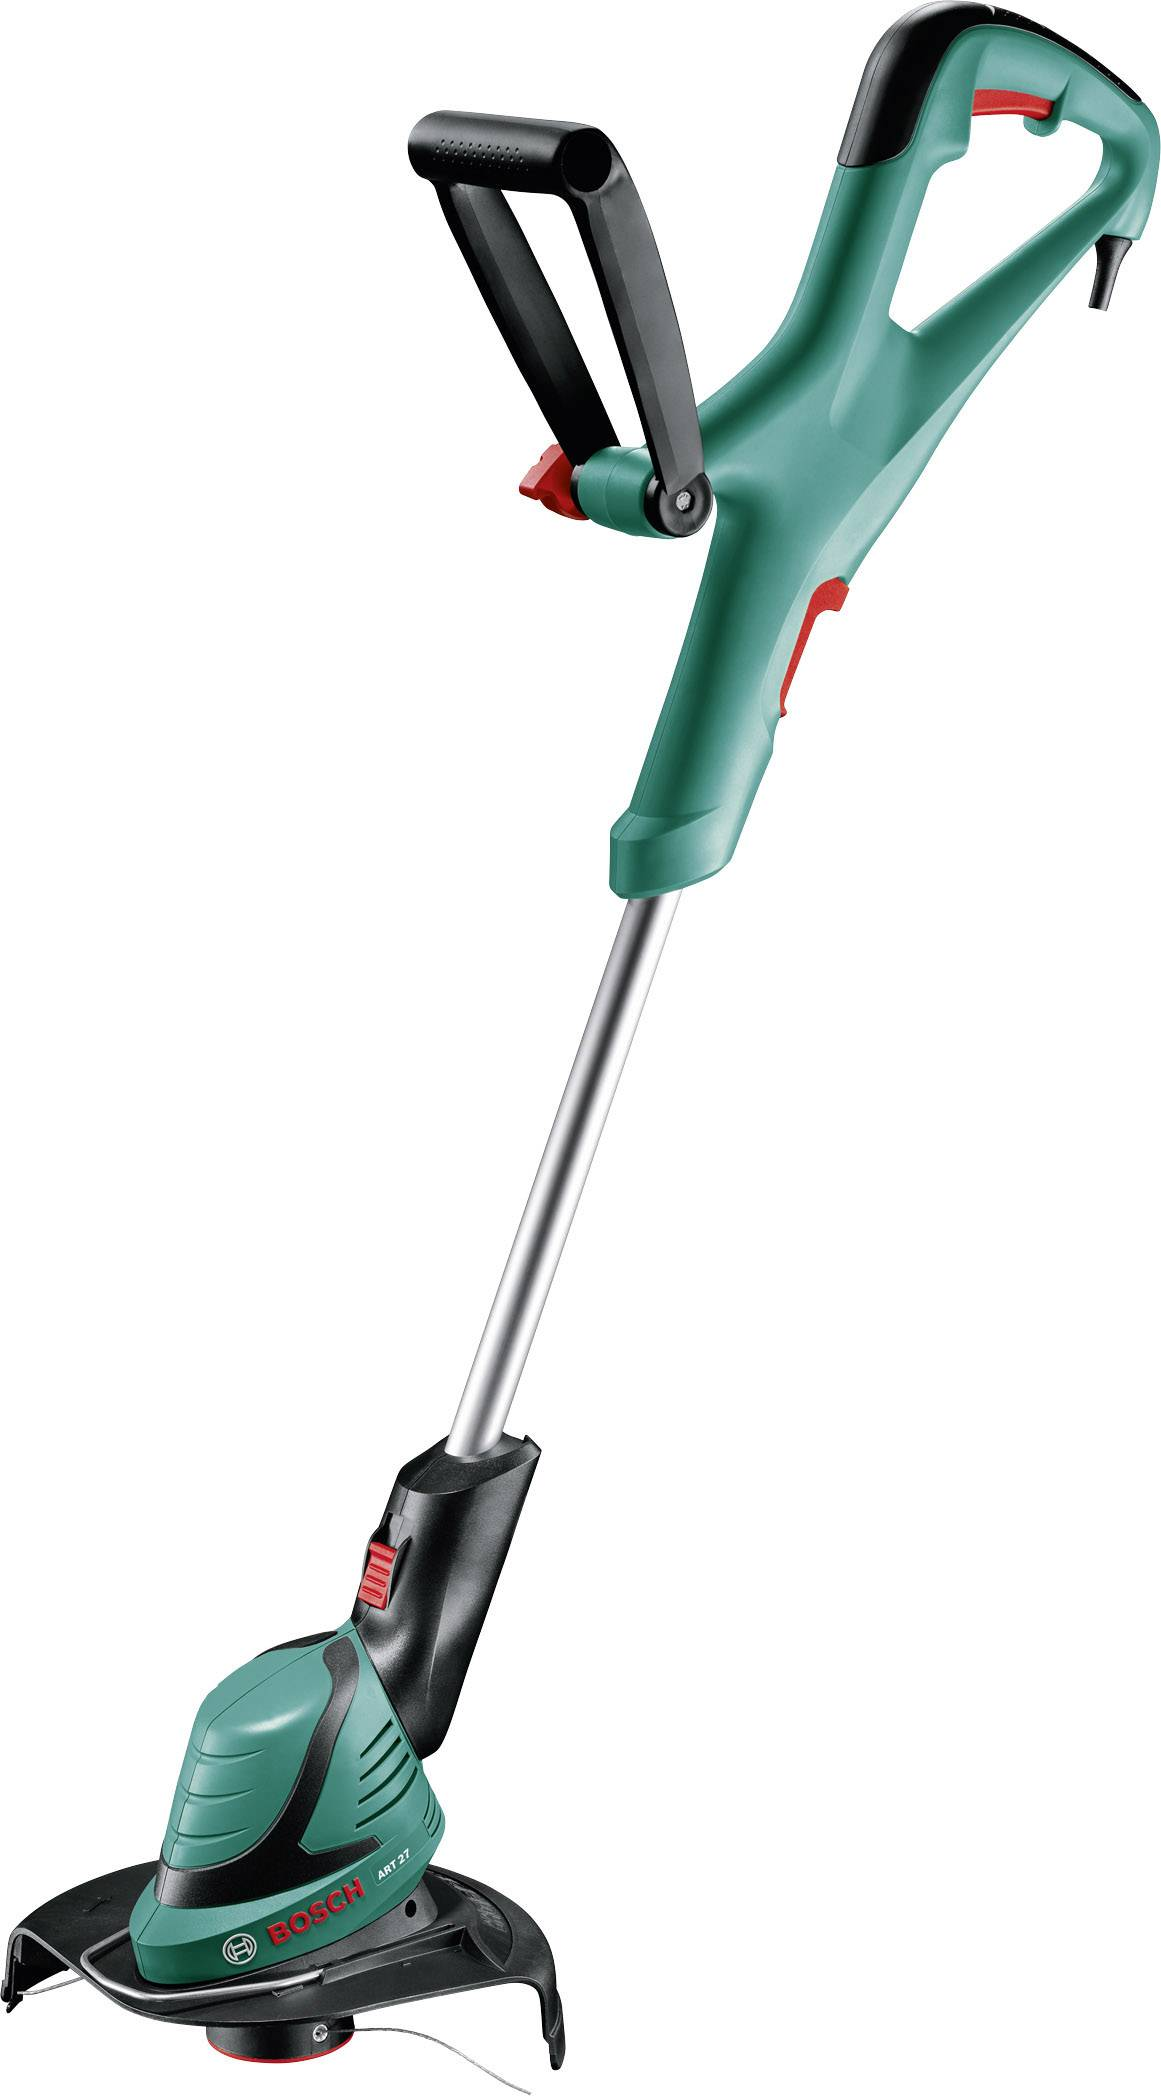 Bosch ART 24 27 30 30-36Li Strimmer Replacement 6m Cutting Line Spool F016800351